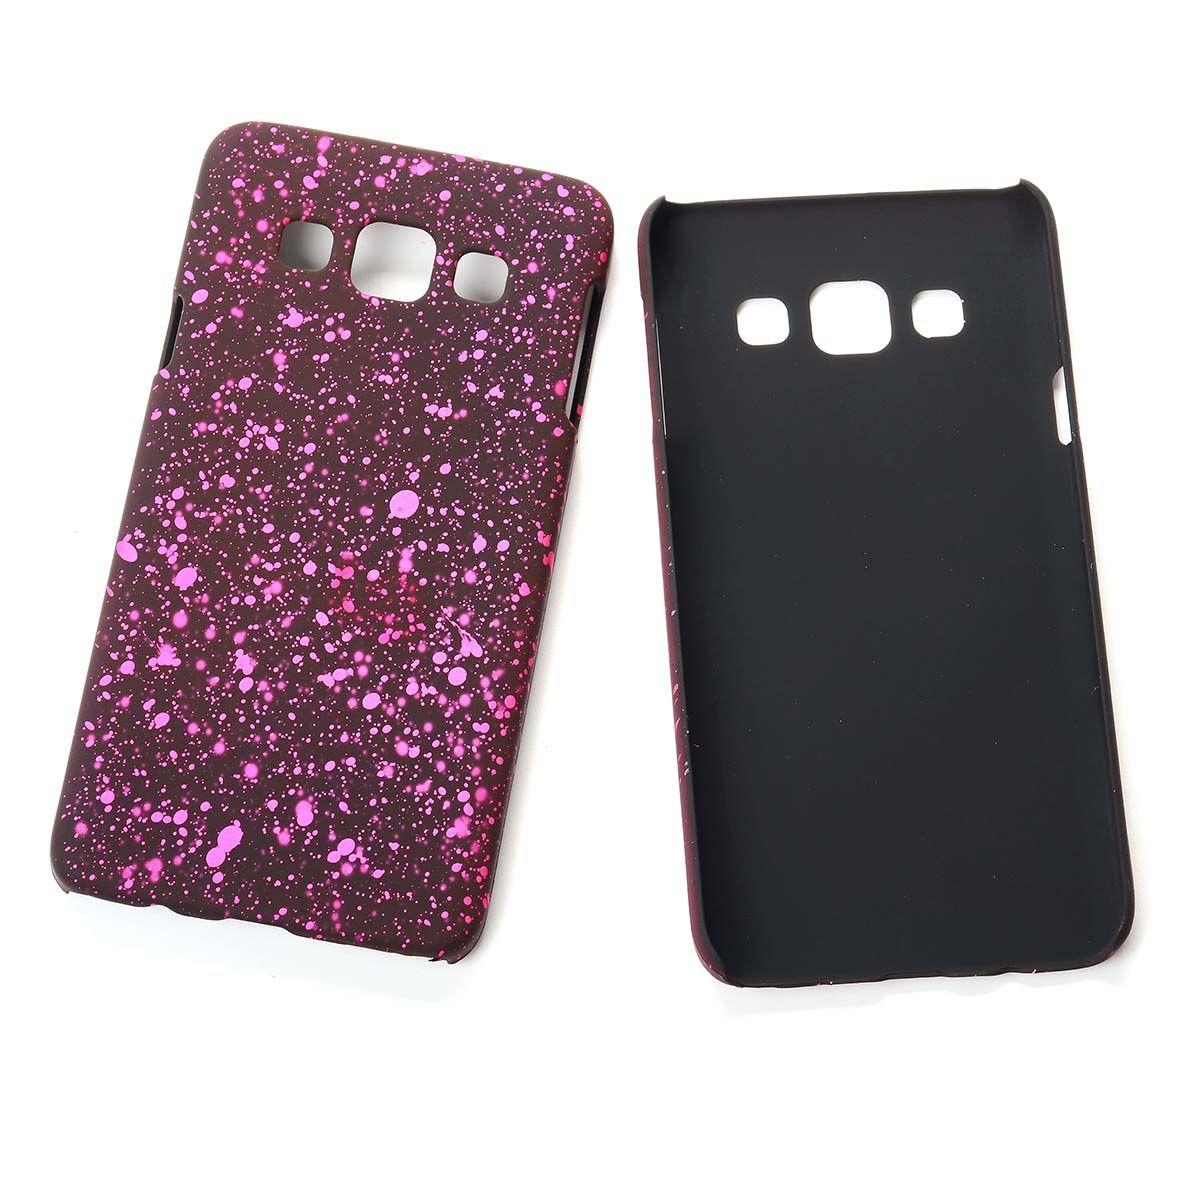 handy h lle schutz case bumper schale f r samsung galaxy a3 2015 3d sterne pink. Black Bedroom Furniture Sets. Home Design Ideas